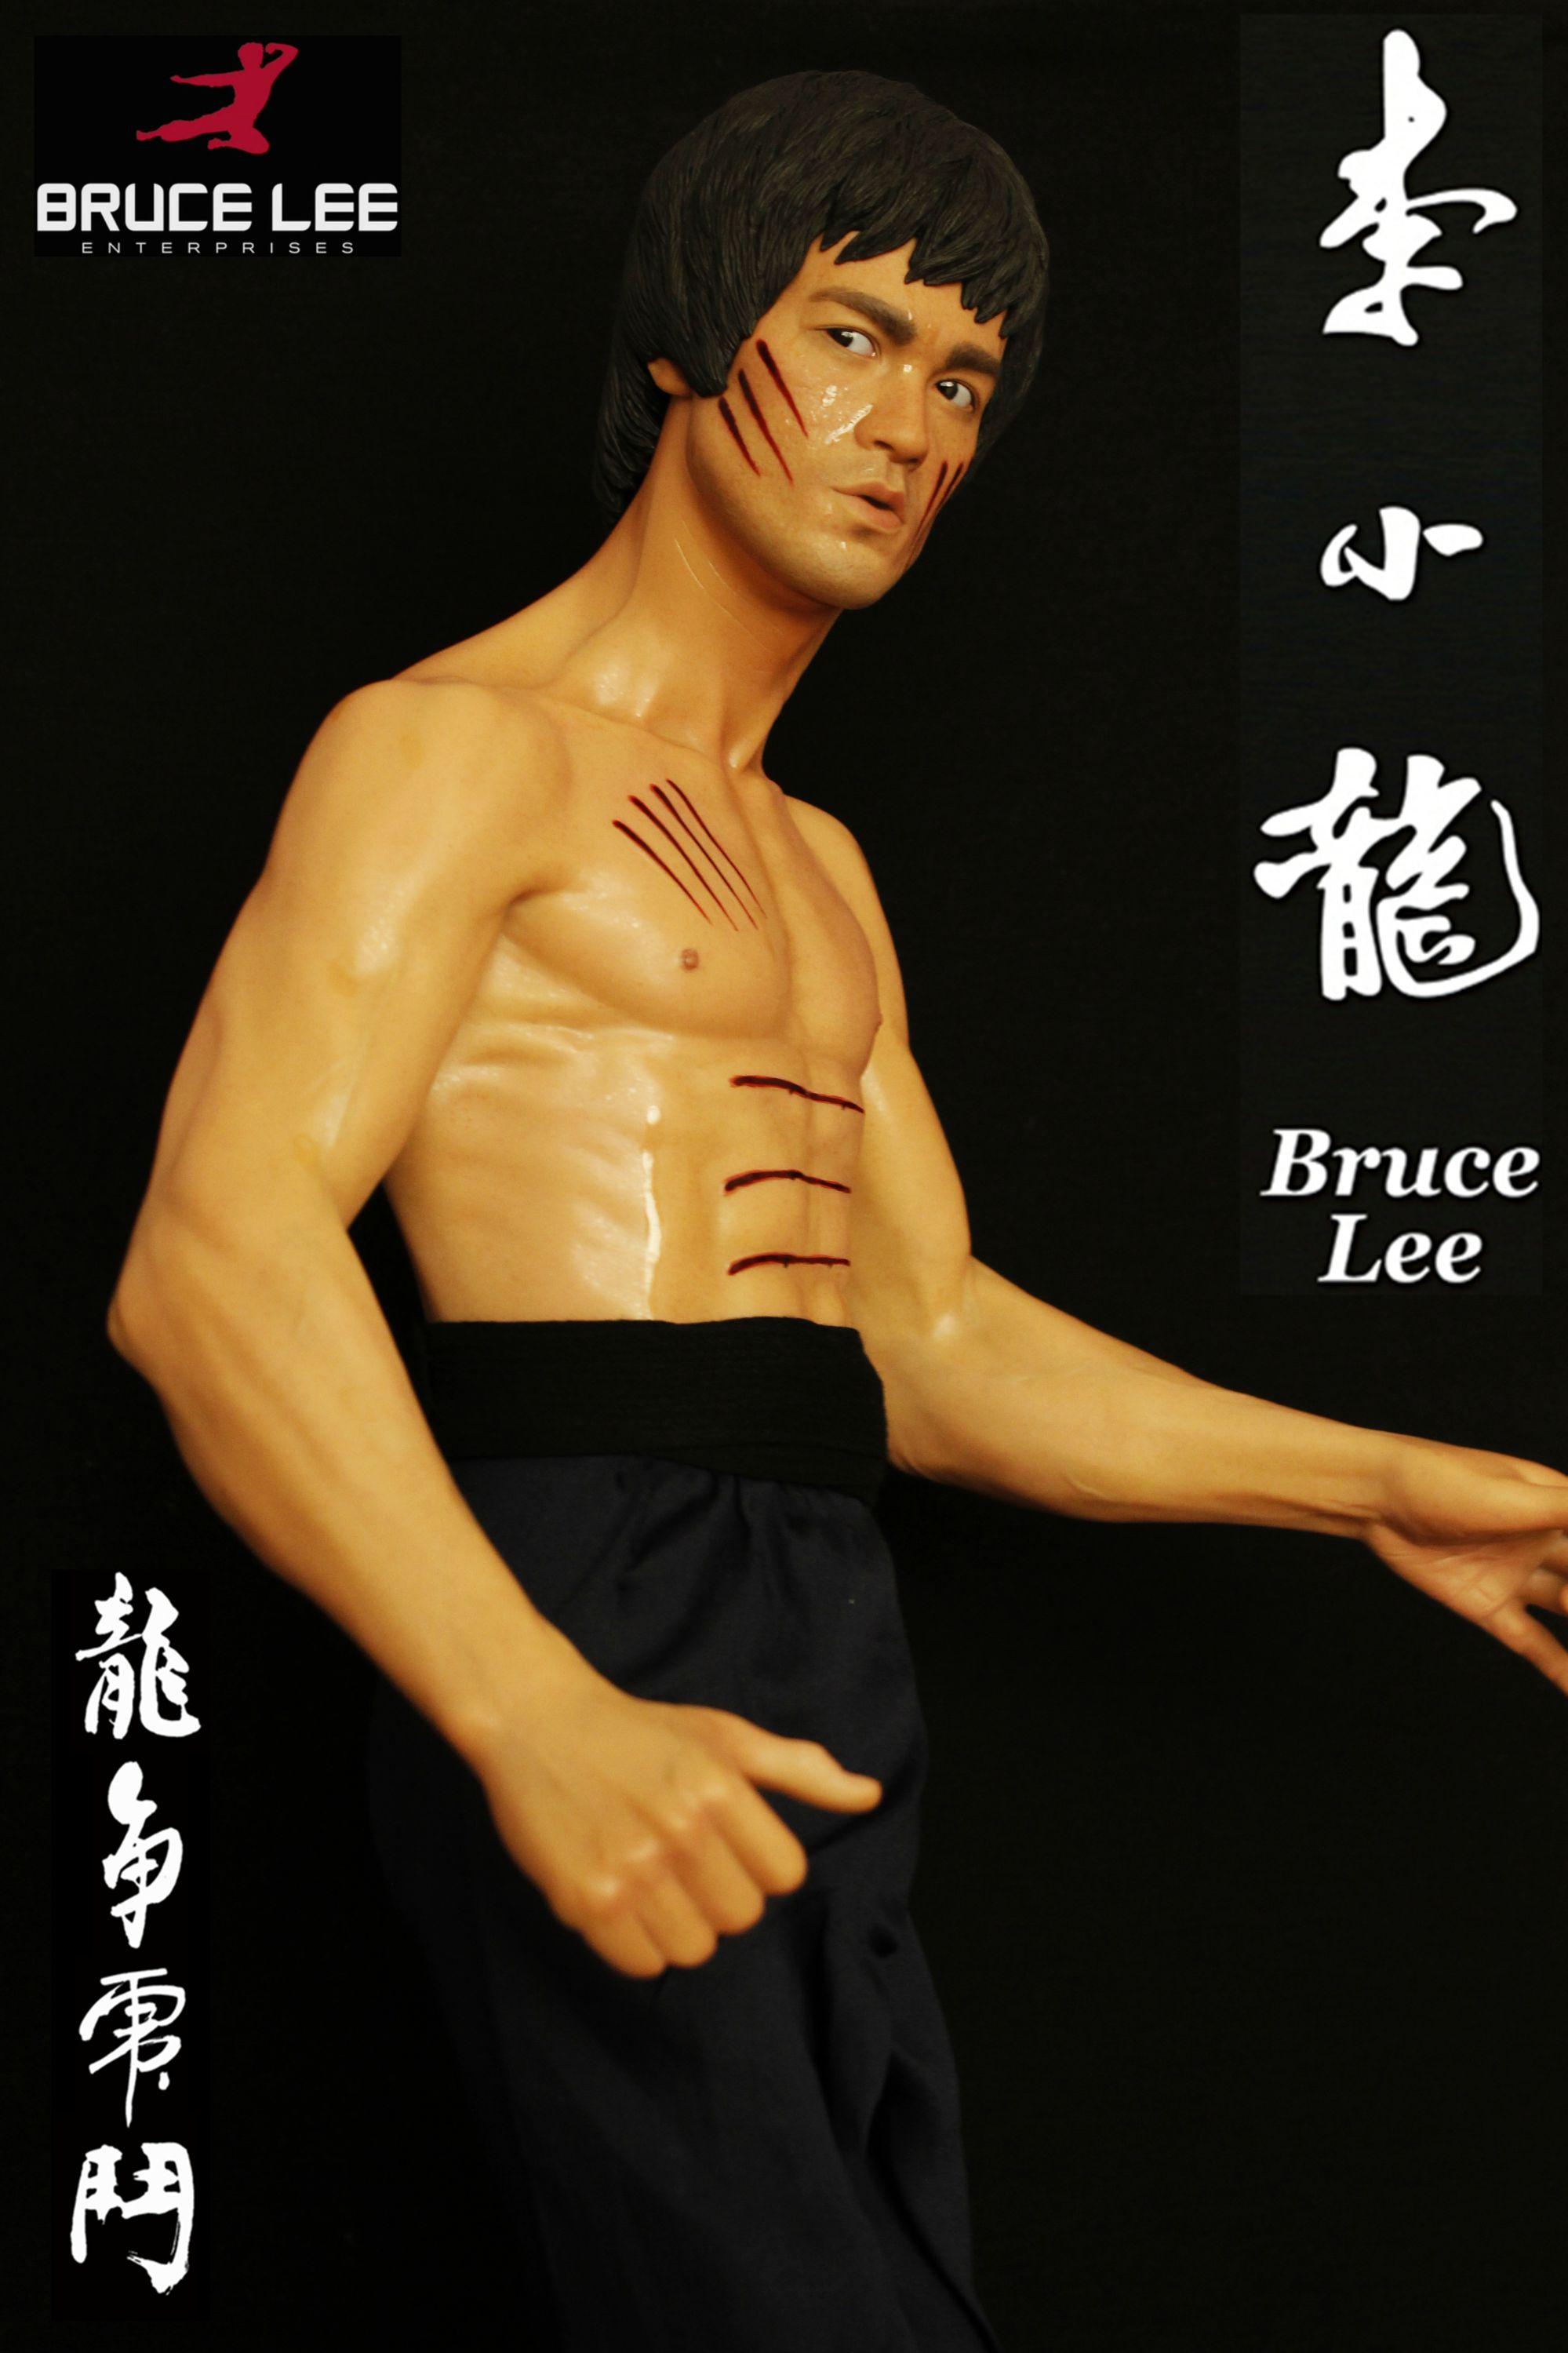 [Blitzway] Bruce Lee Tribute - 1/3 Scale - LANÇADO!!! - Página 6 211953qtobztbb3jubrdlb